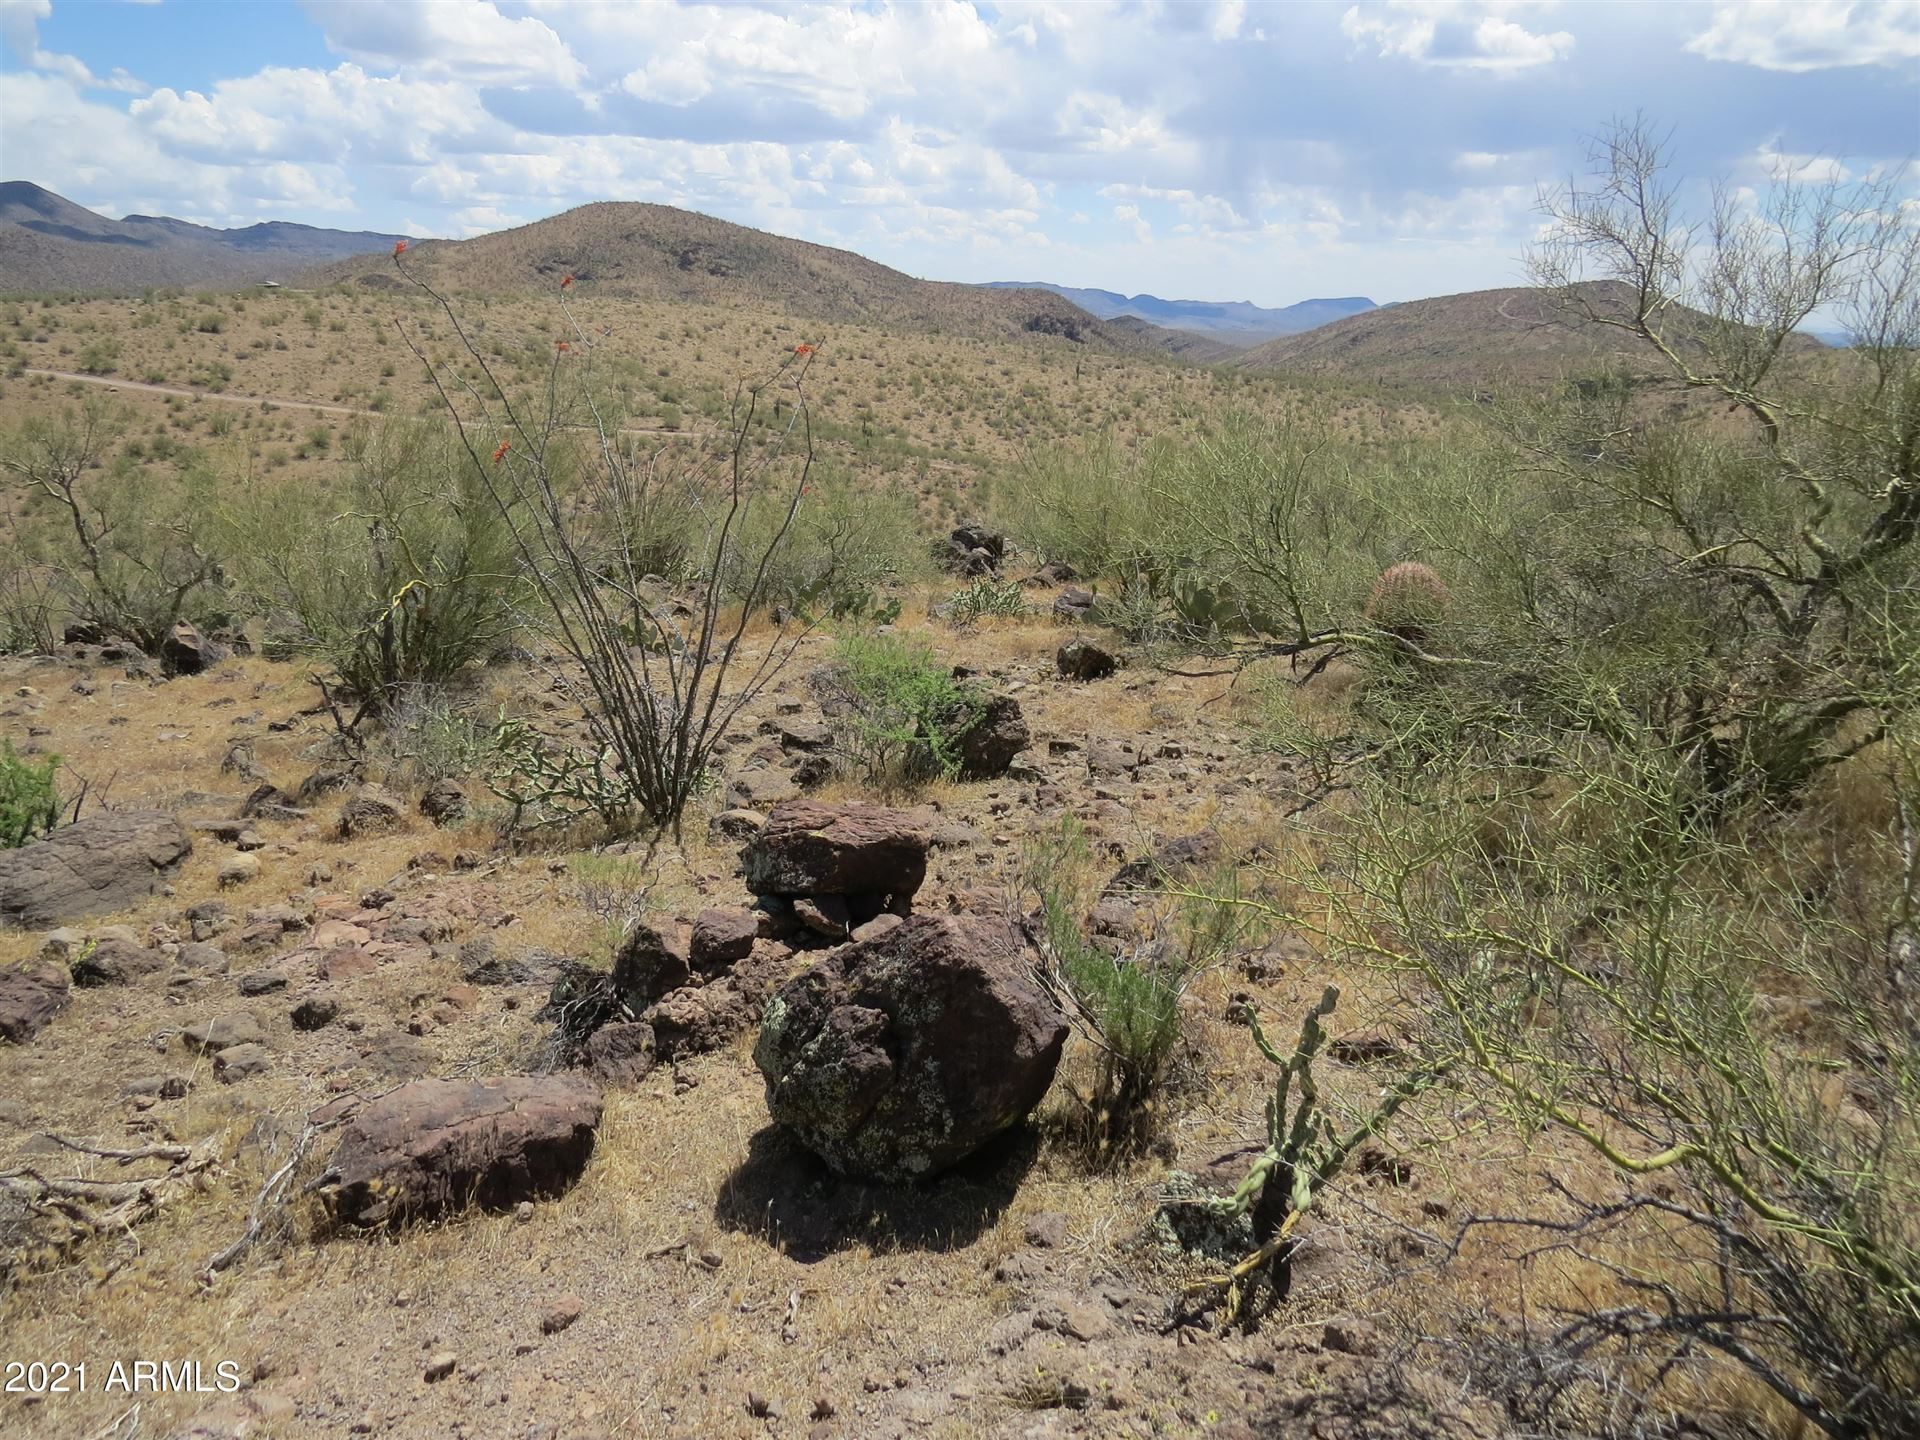 Photo of 0000 N Columbia lot 75 A Road, Morristown, AZ 85342 (MLS # 6230371)